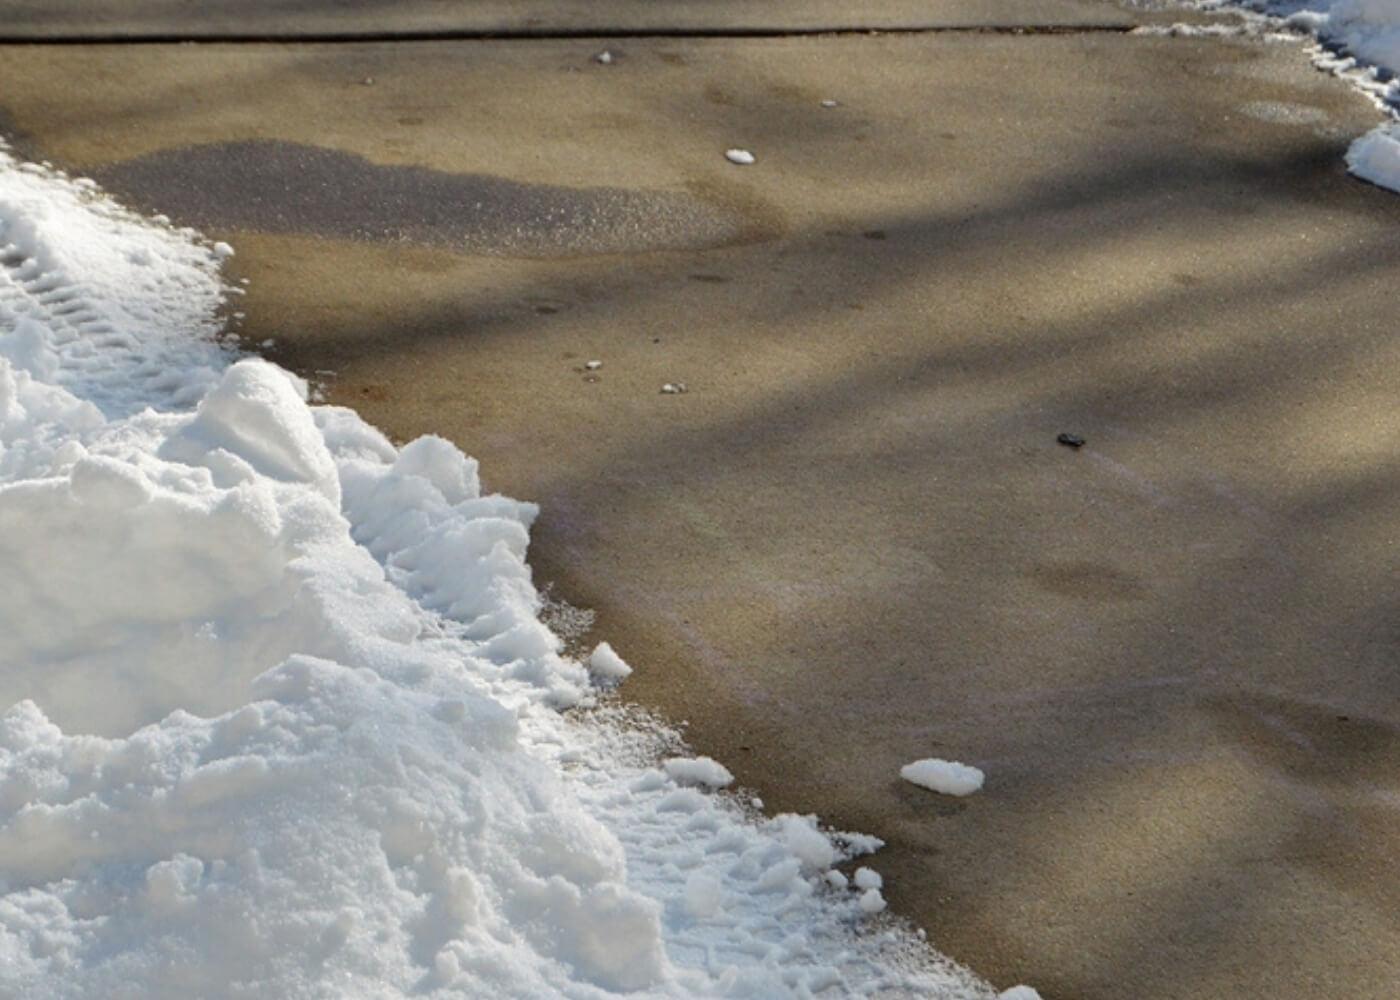 heat driveway clearing in winter